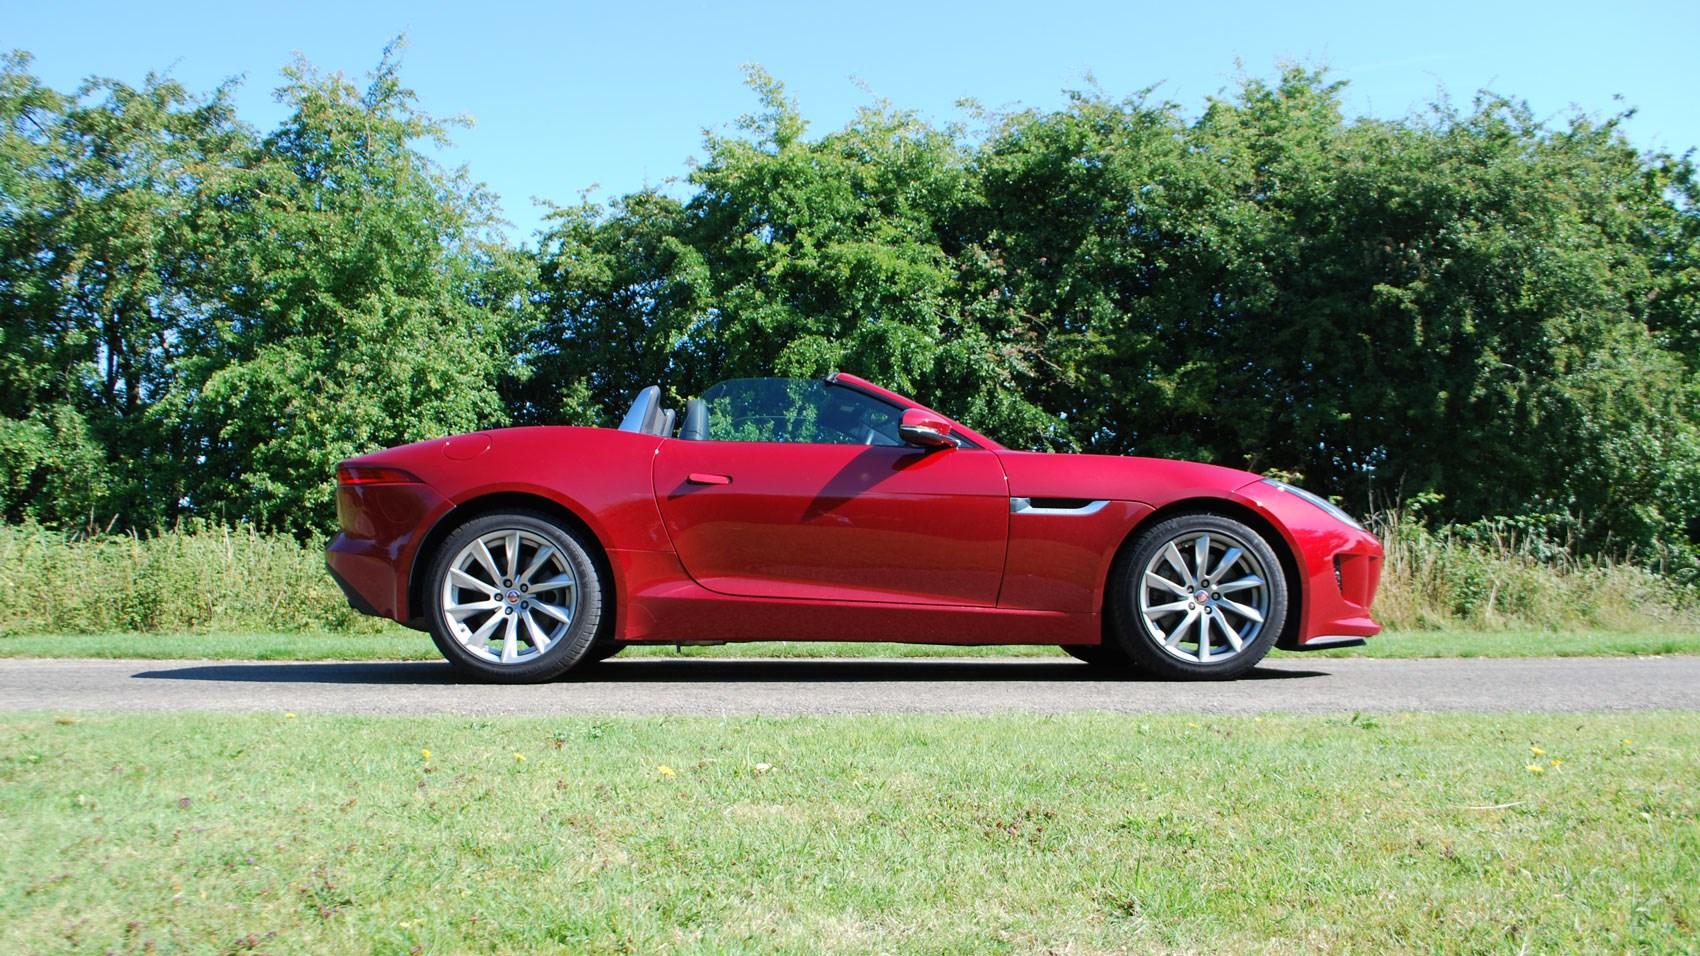 Jaguar F-type 3.0 V6 manual (2015) review by CAR Magazine